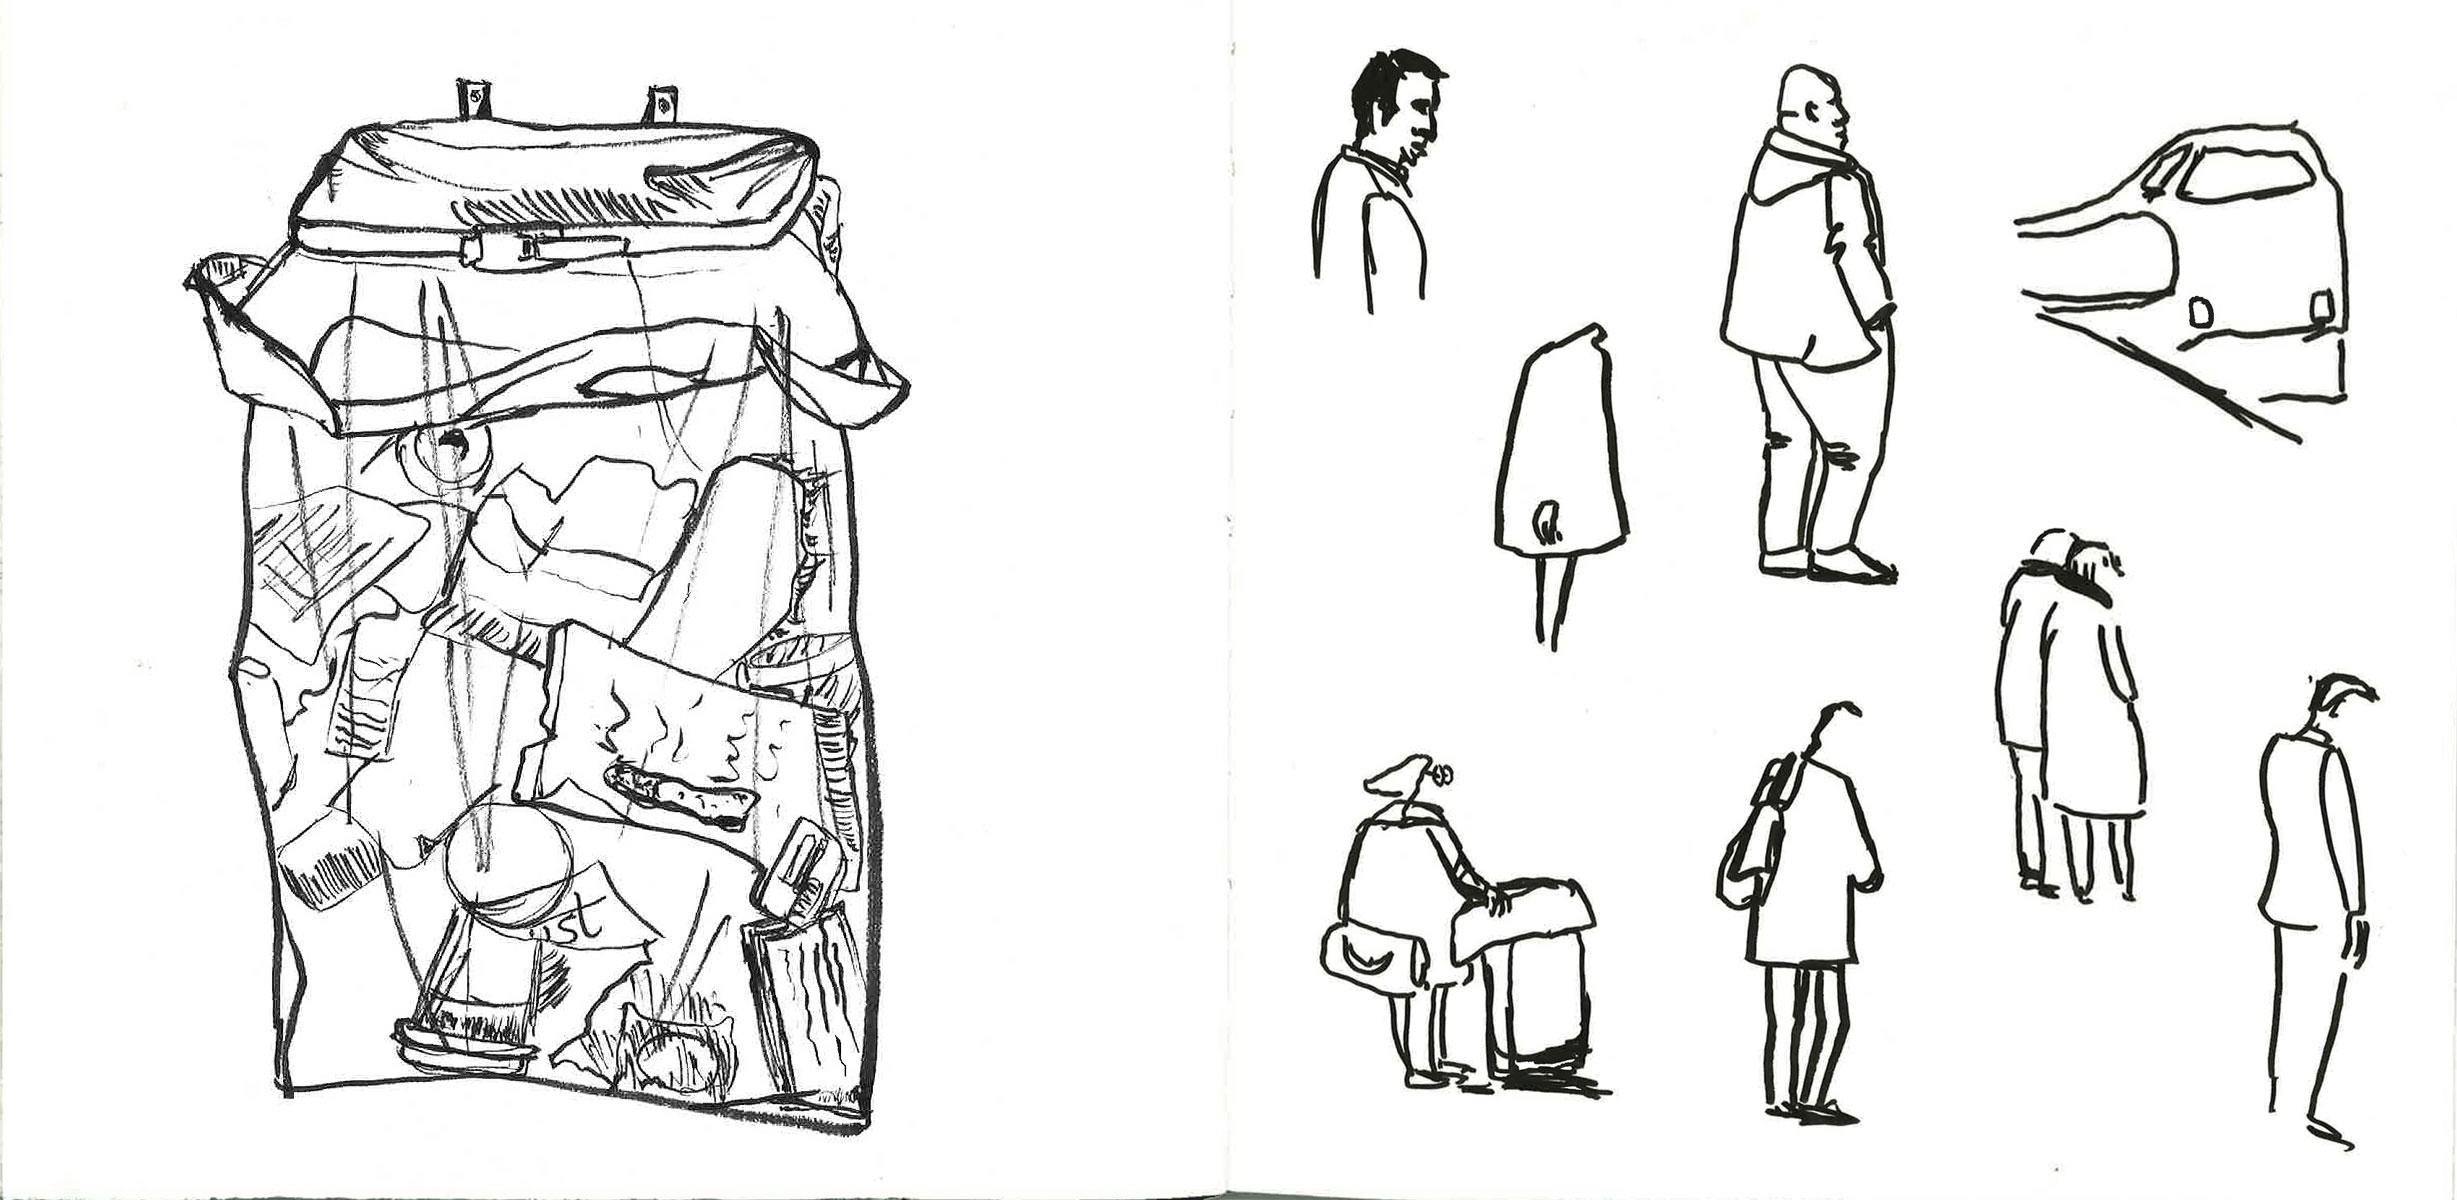 early sketch figures and trash can at deventer station sketch people walking by ellen vesters illustrator ma childrens book illustration